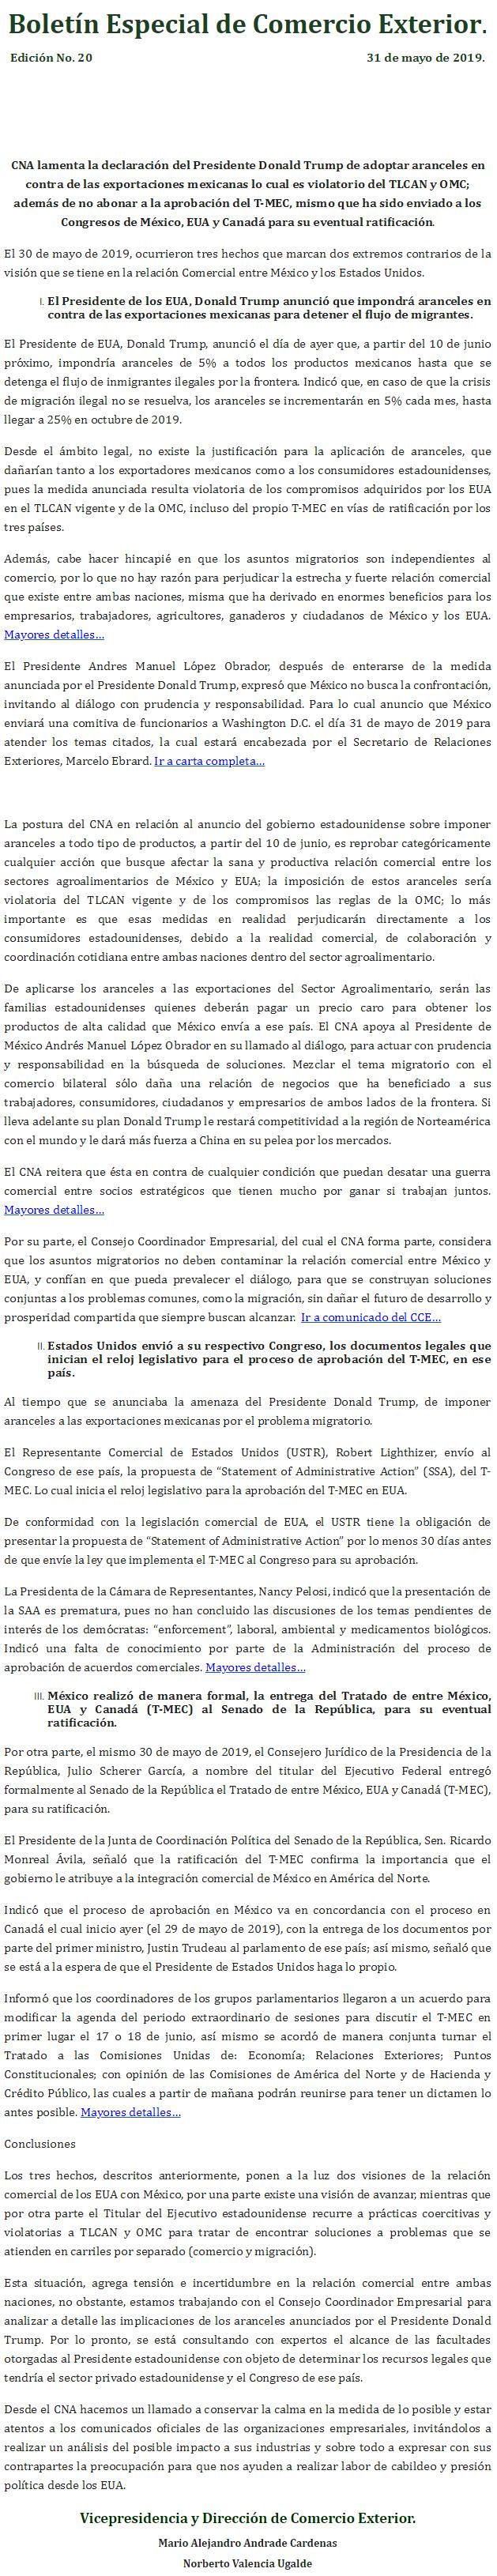 Boletín Especial de Comercio Exterior del CNA Ed. No. 20